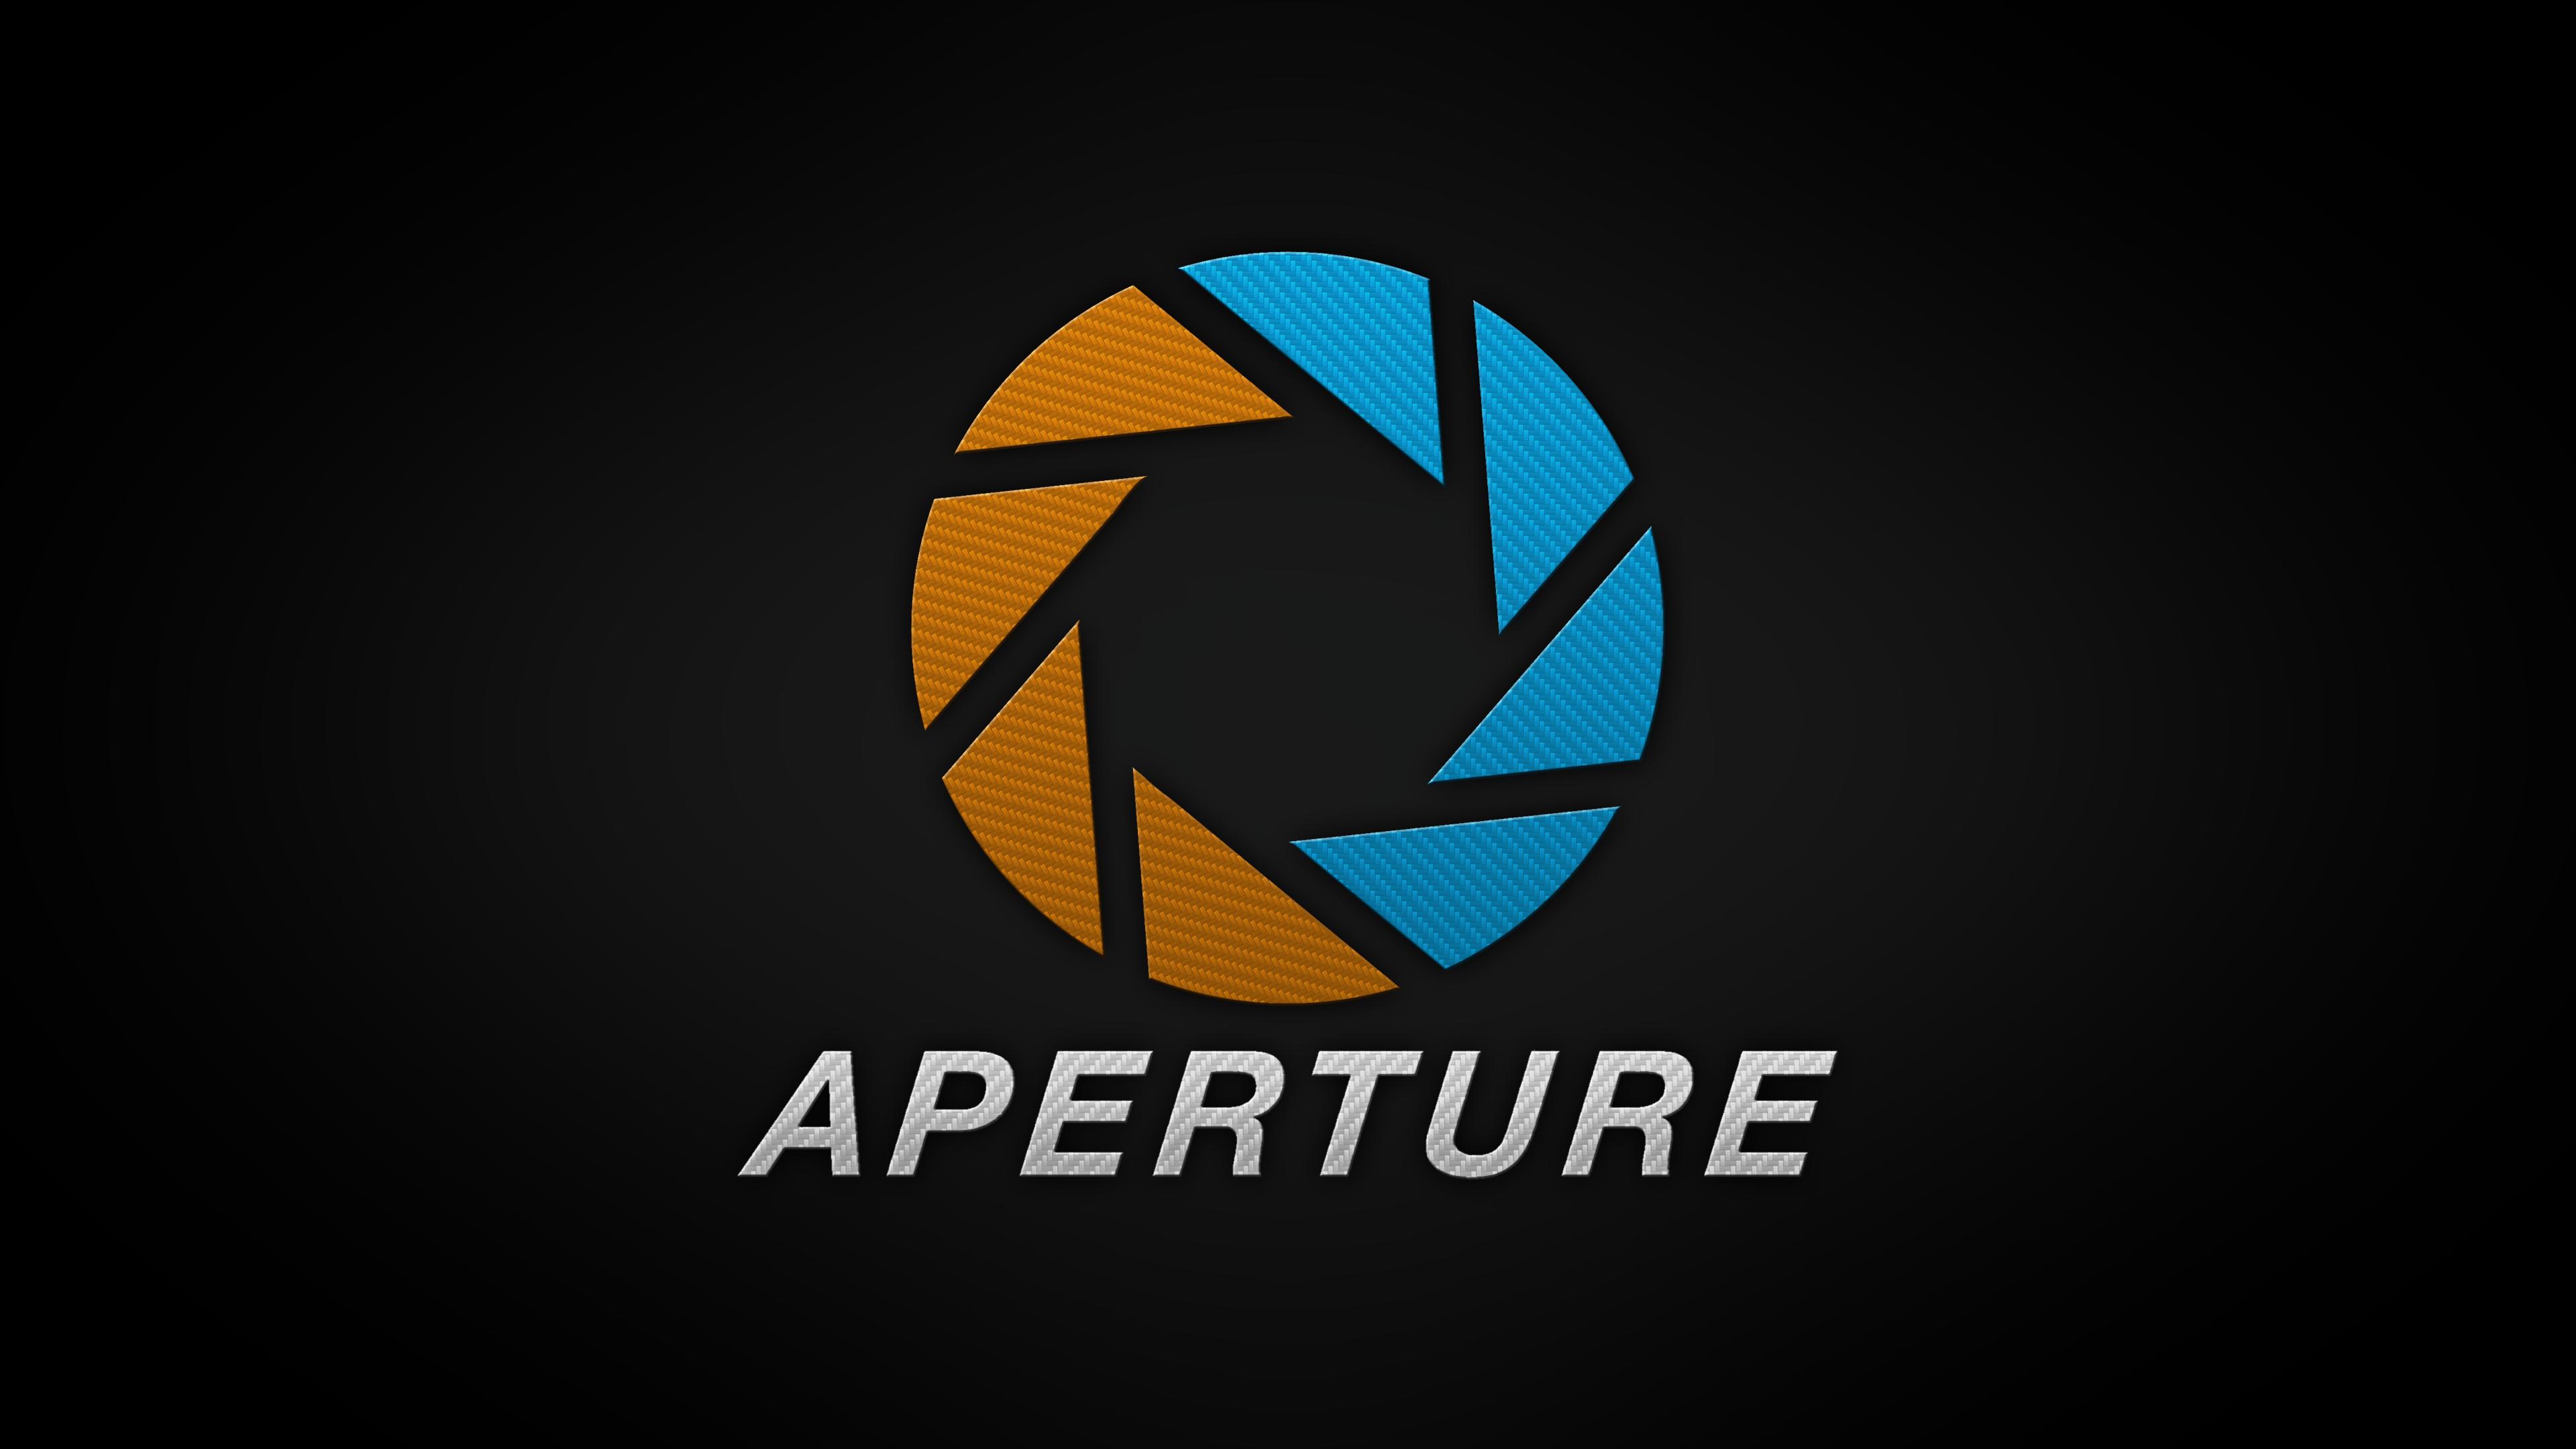 Aperture brand logo hd logo 4k wallpapers images for Brand wallpaper